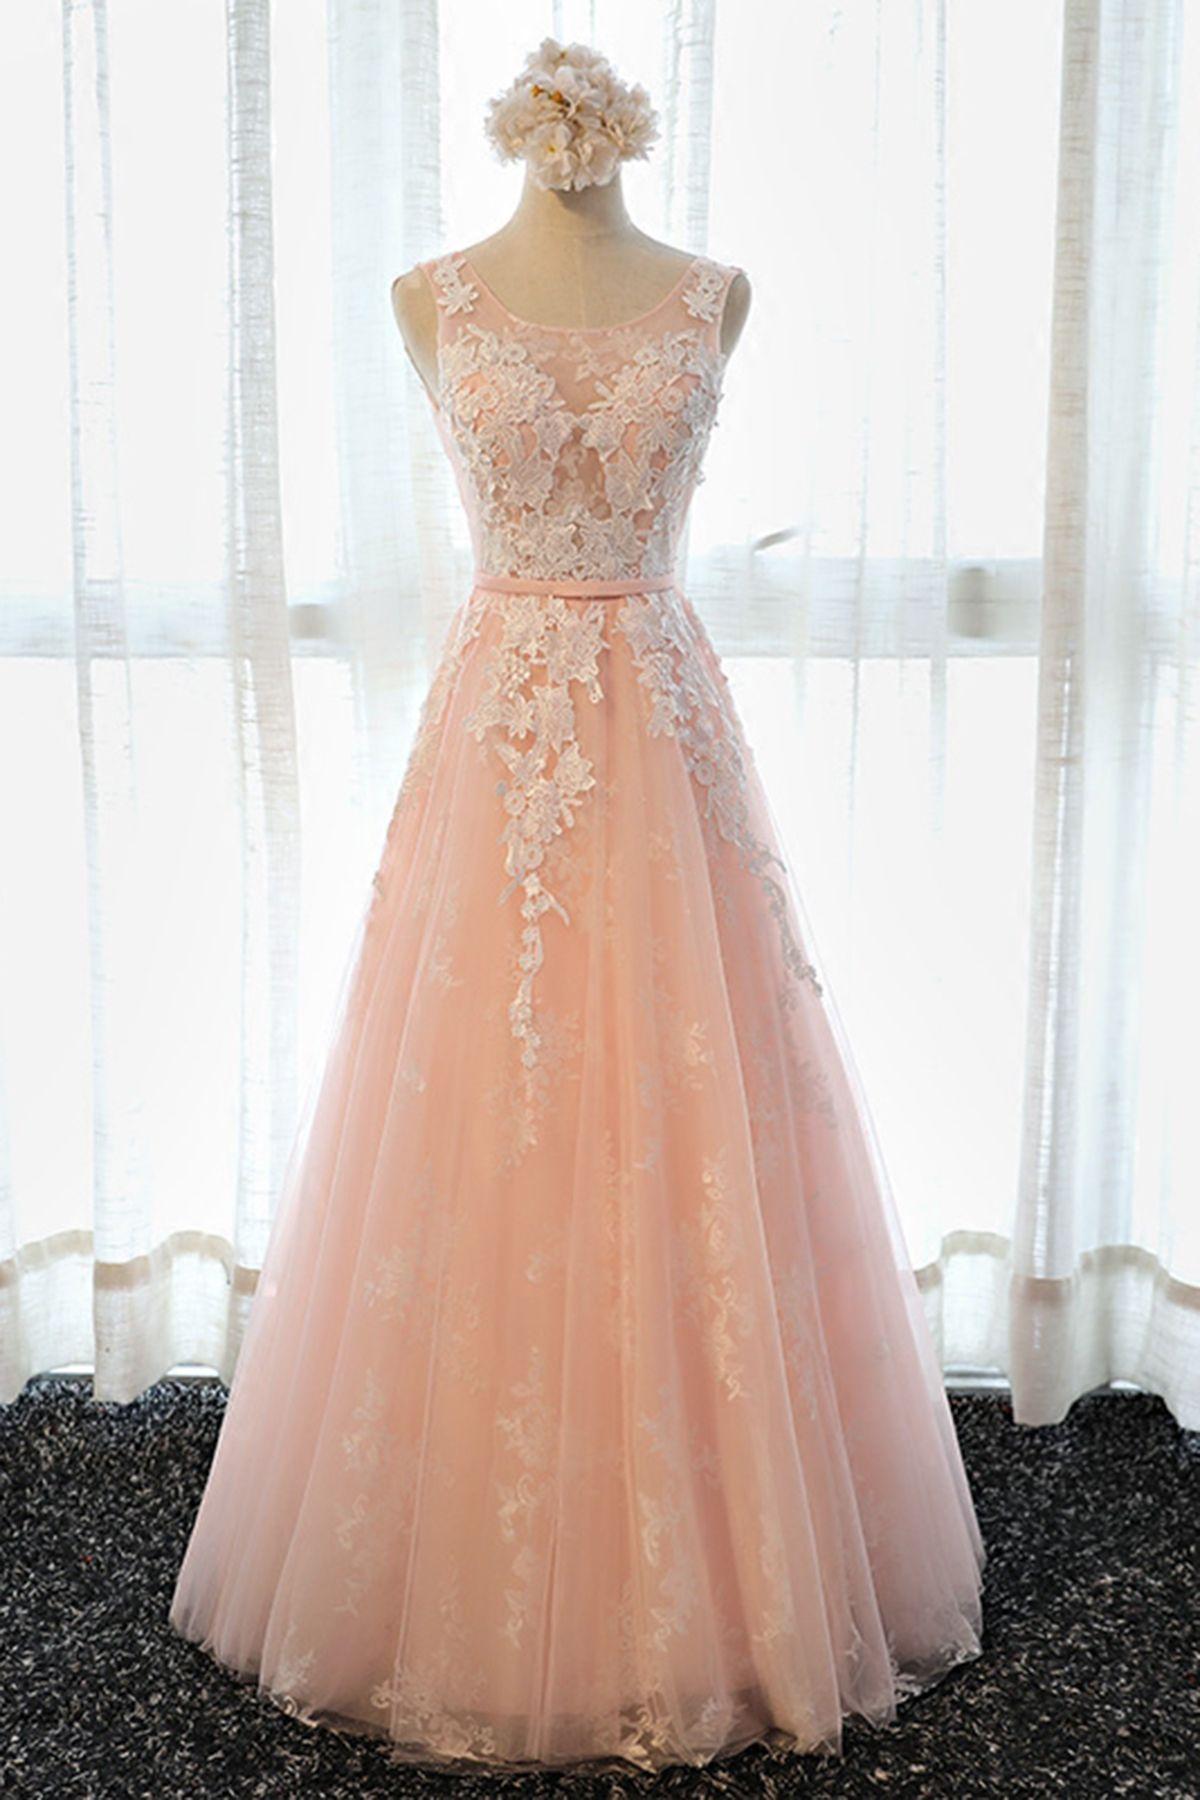 34fcdb86c5e Simple pink lace long senior prom dress